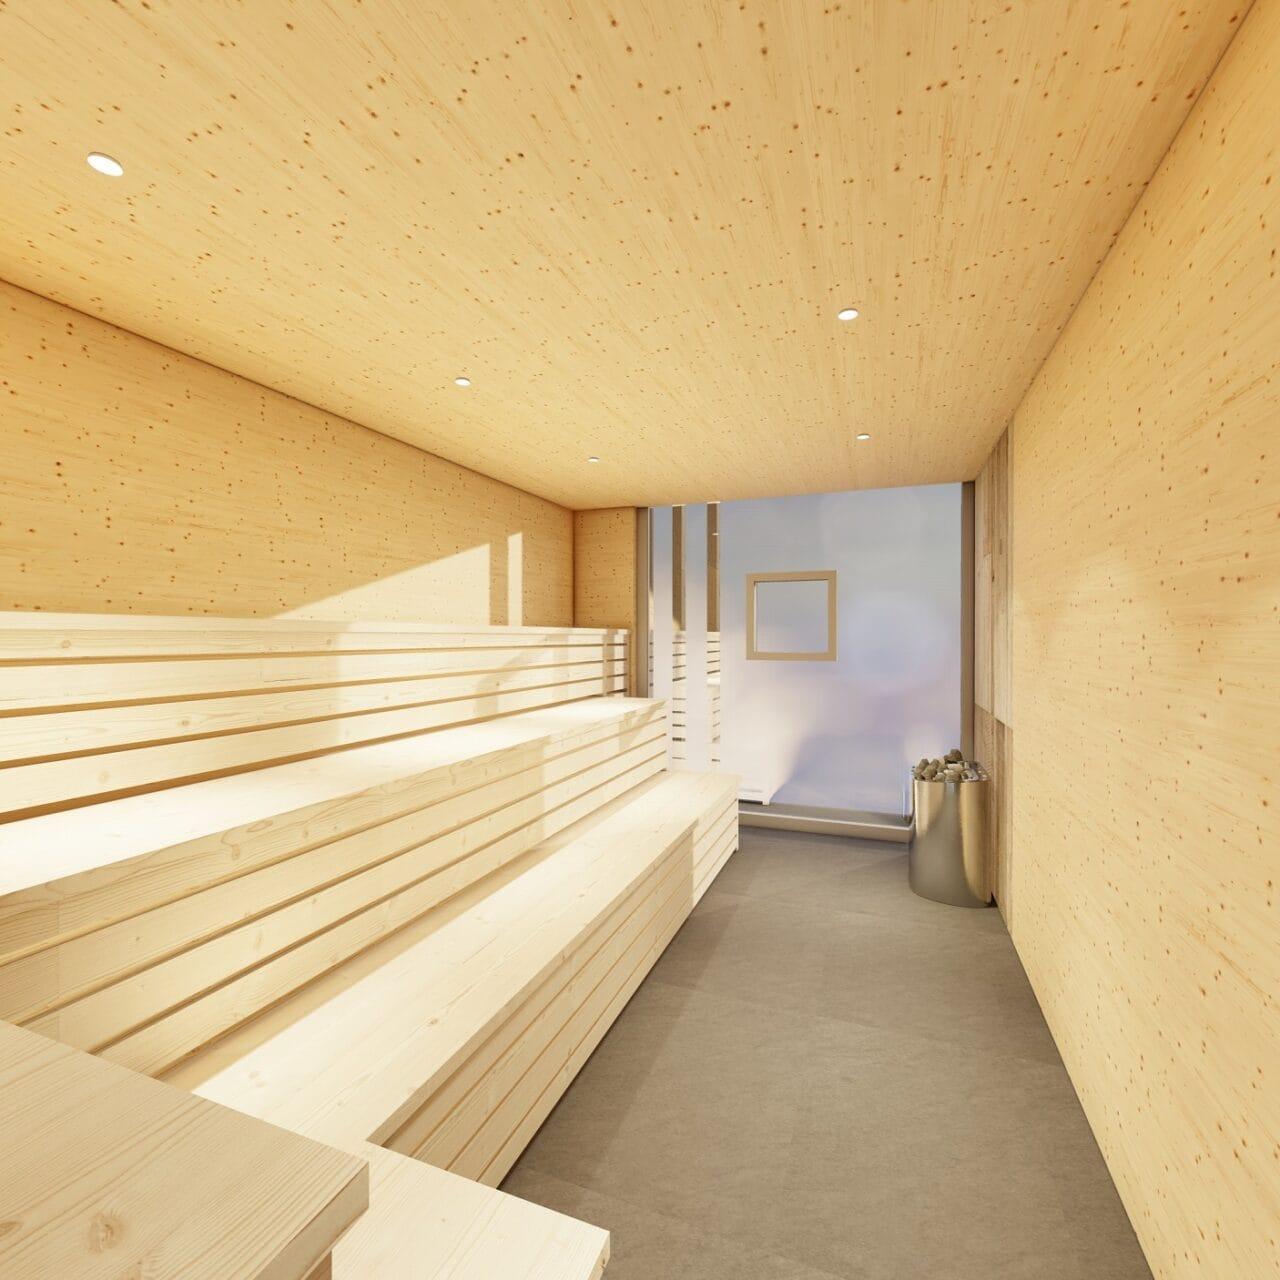 hofgut-apartment-lifestyle-resort-erlebenimhofgut-poolwellness-sauna